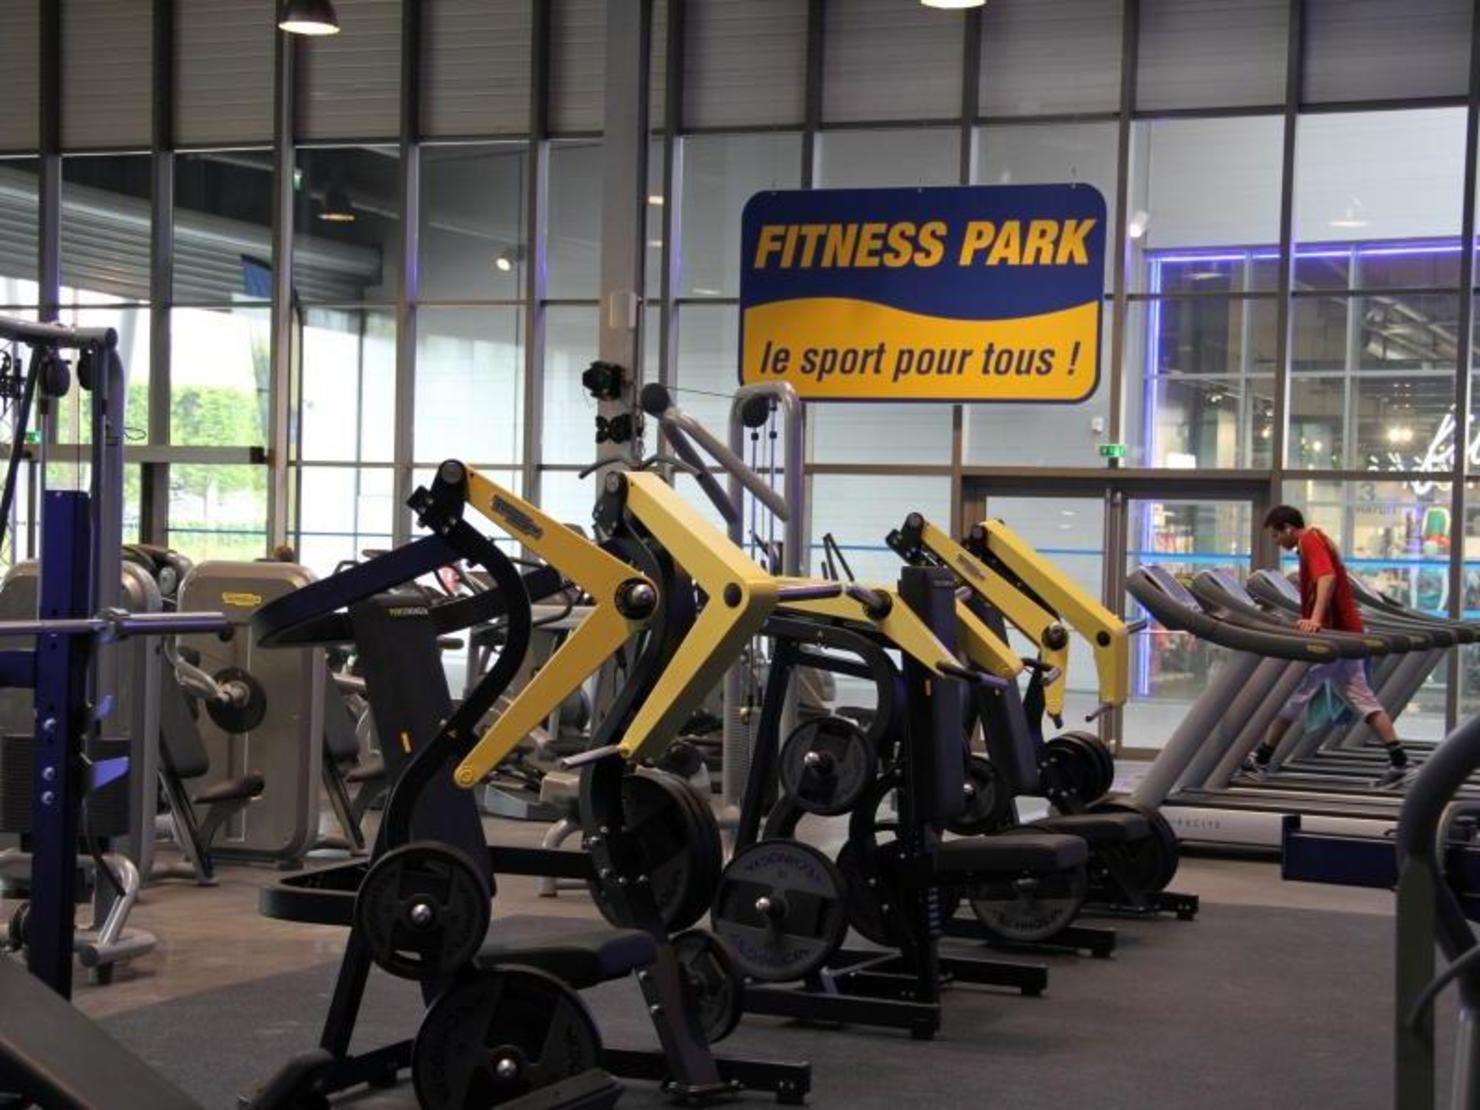 fitness park arras tarifs avis horaires offre d couverte. Black Bedroom Furniture Sets. Home Design Ideas